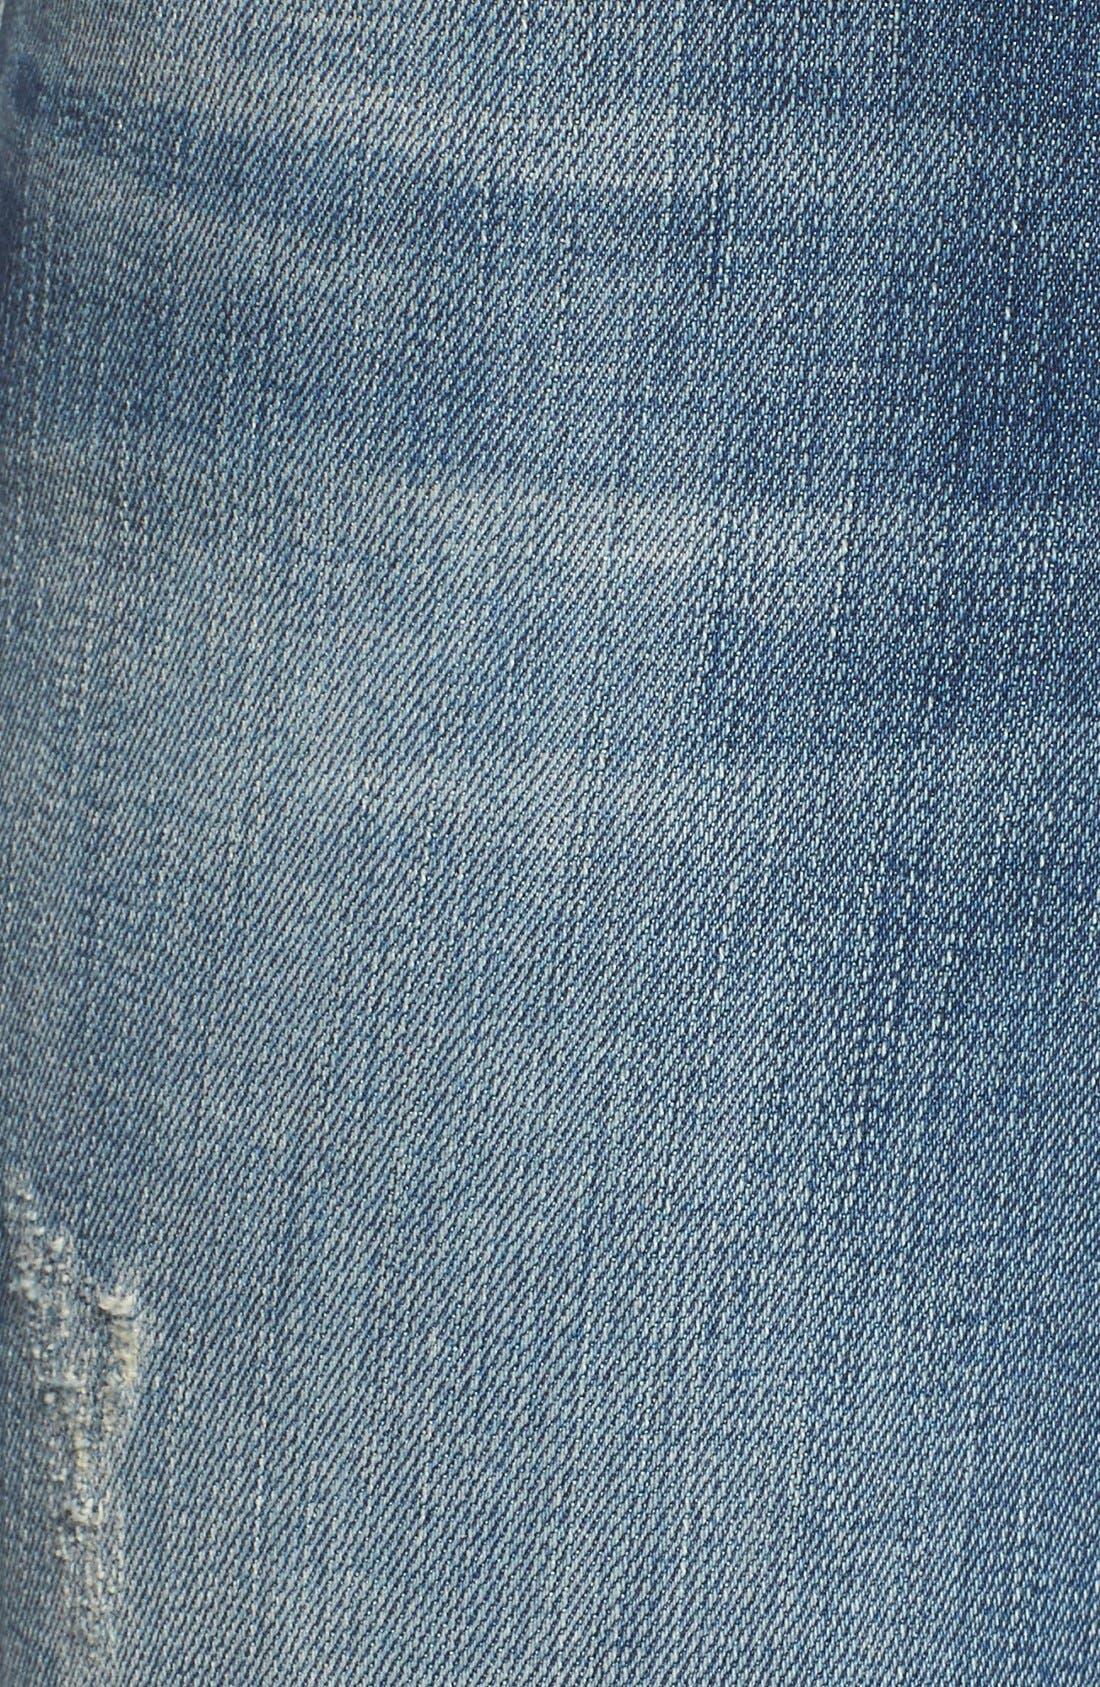 Alana Crop Skinny Jeans,                             Alternate thumbnail 10, color,